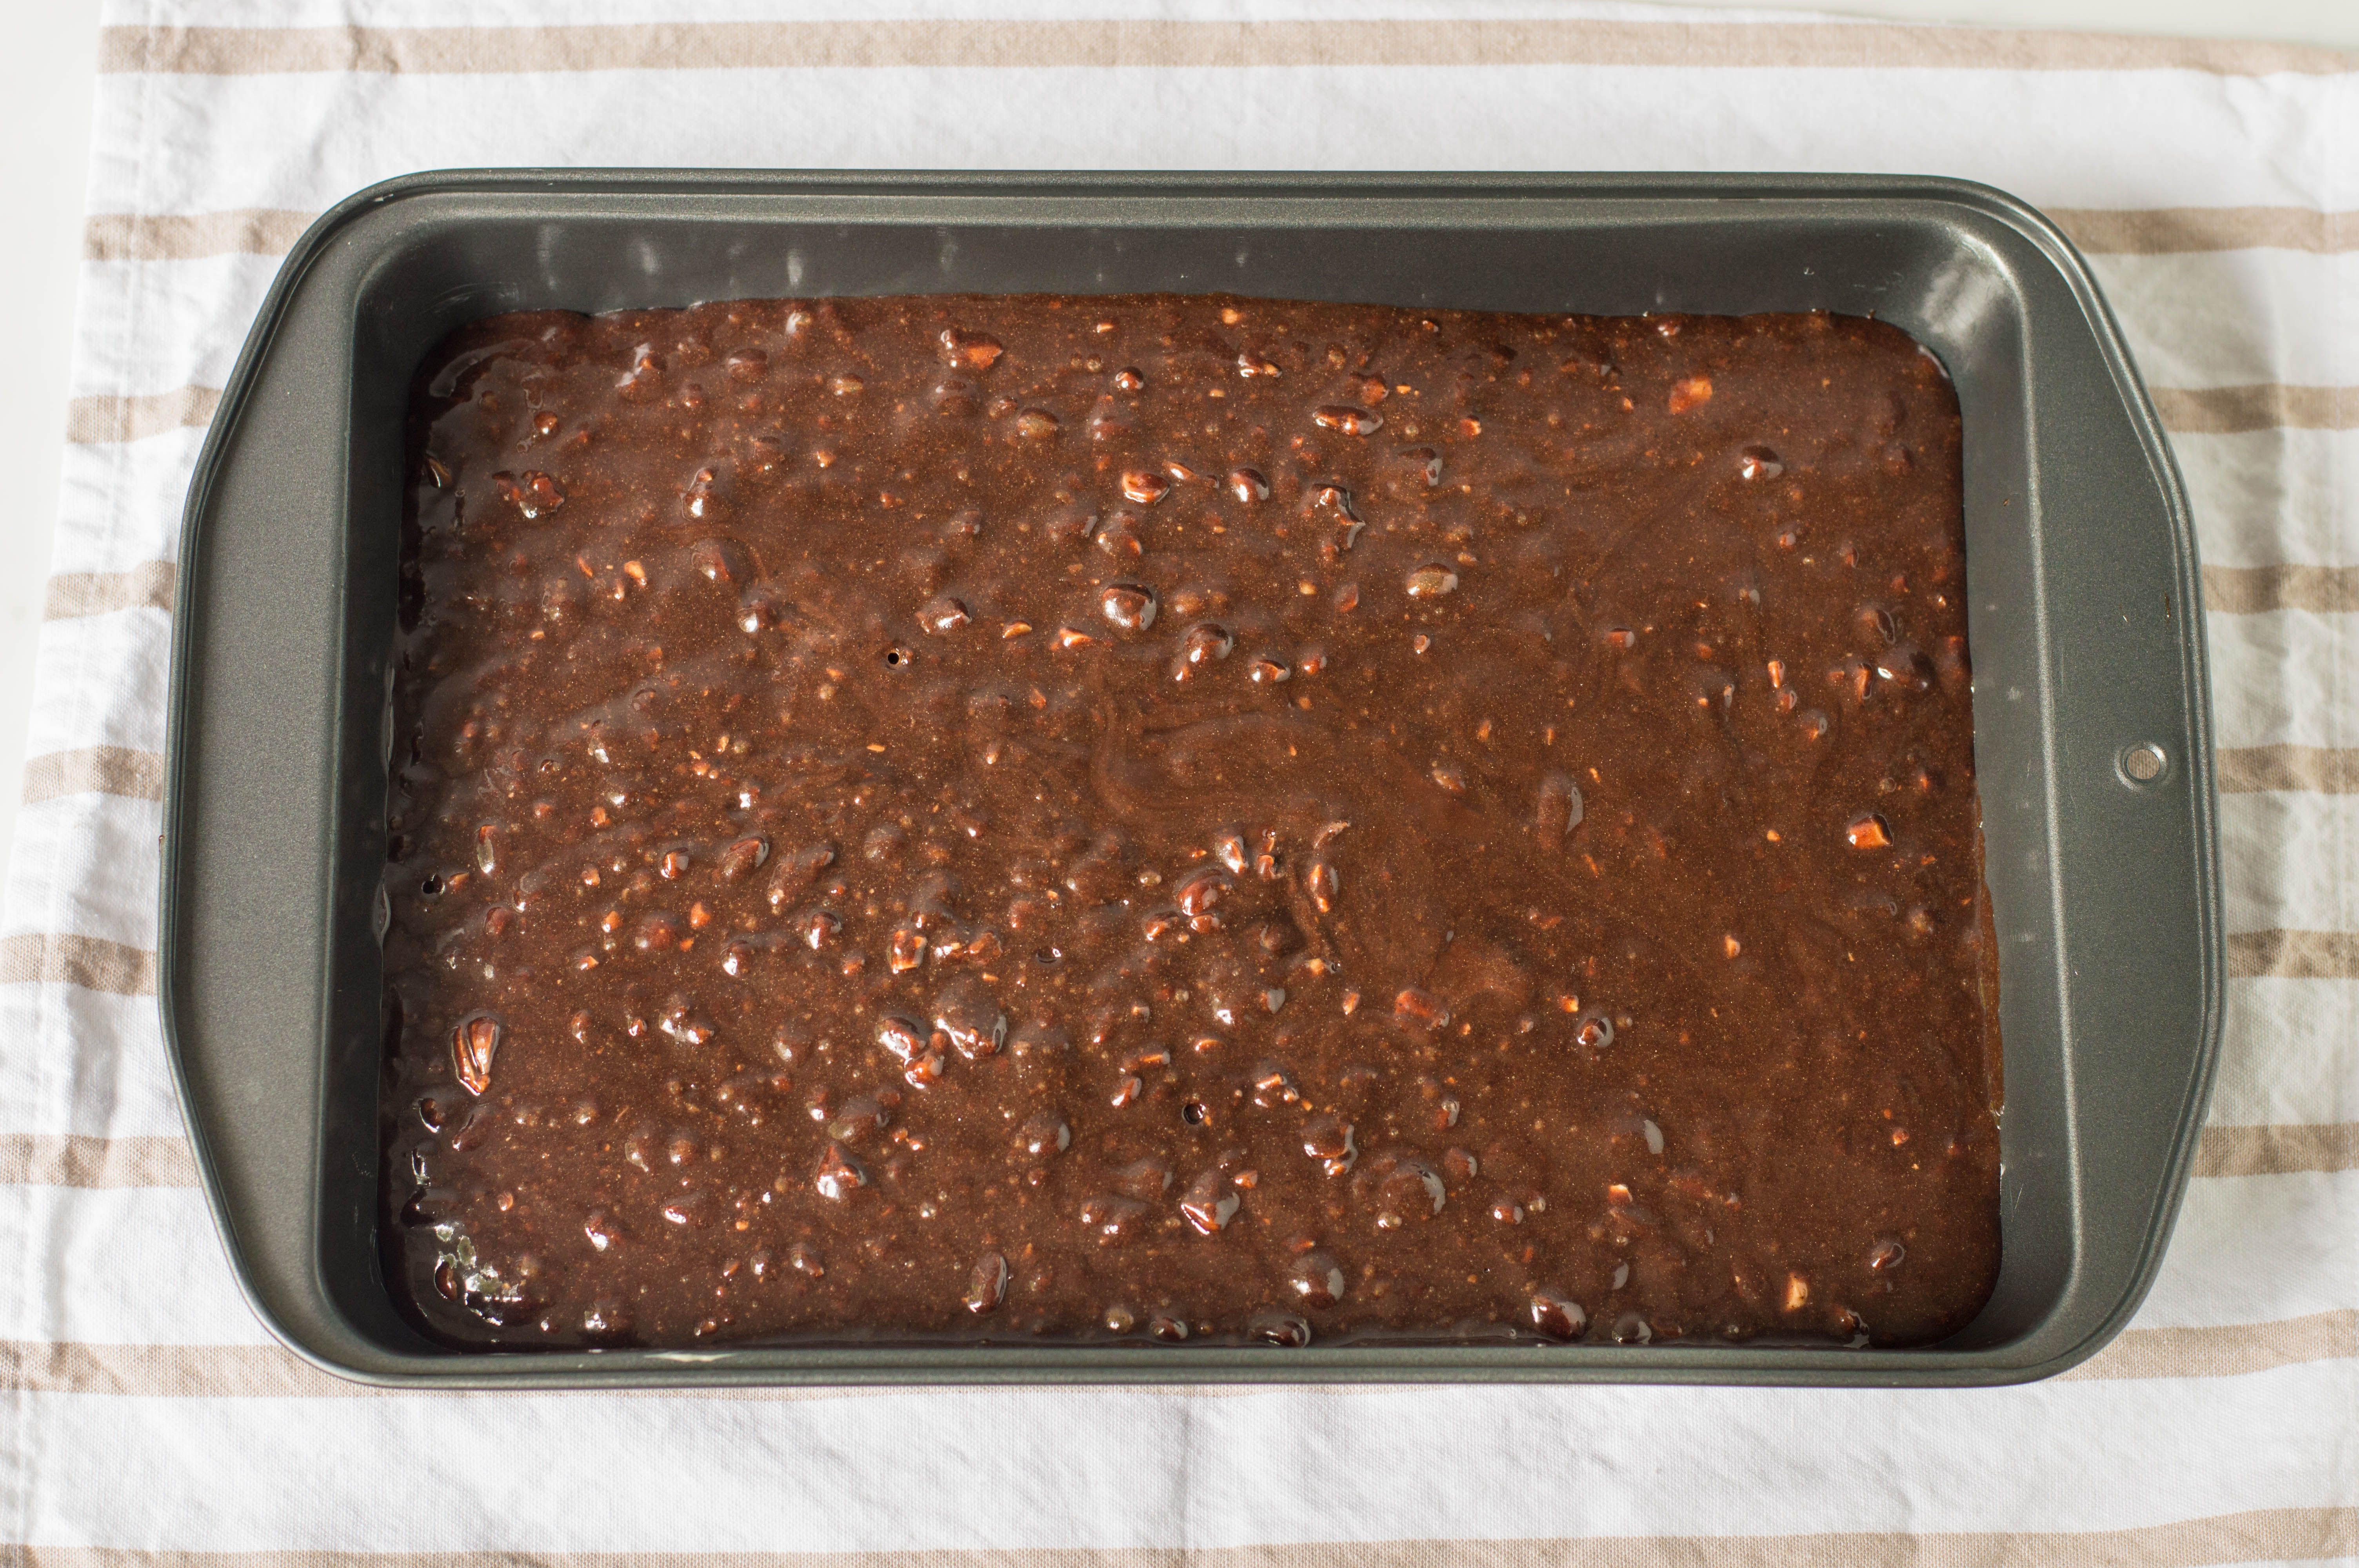 Chocolate Fudge Brownies mixture in baking pan